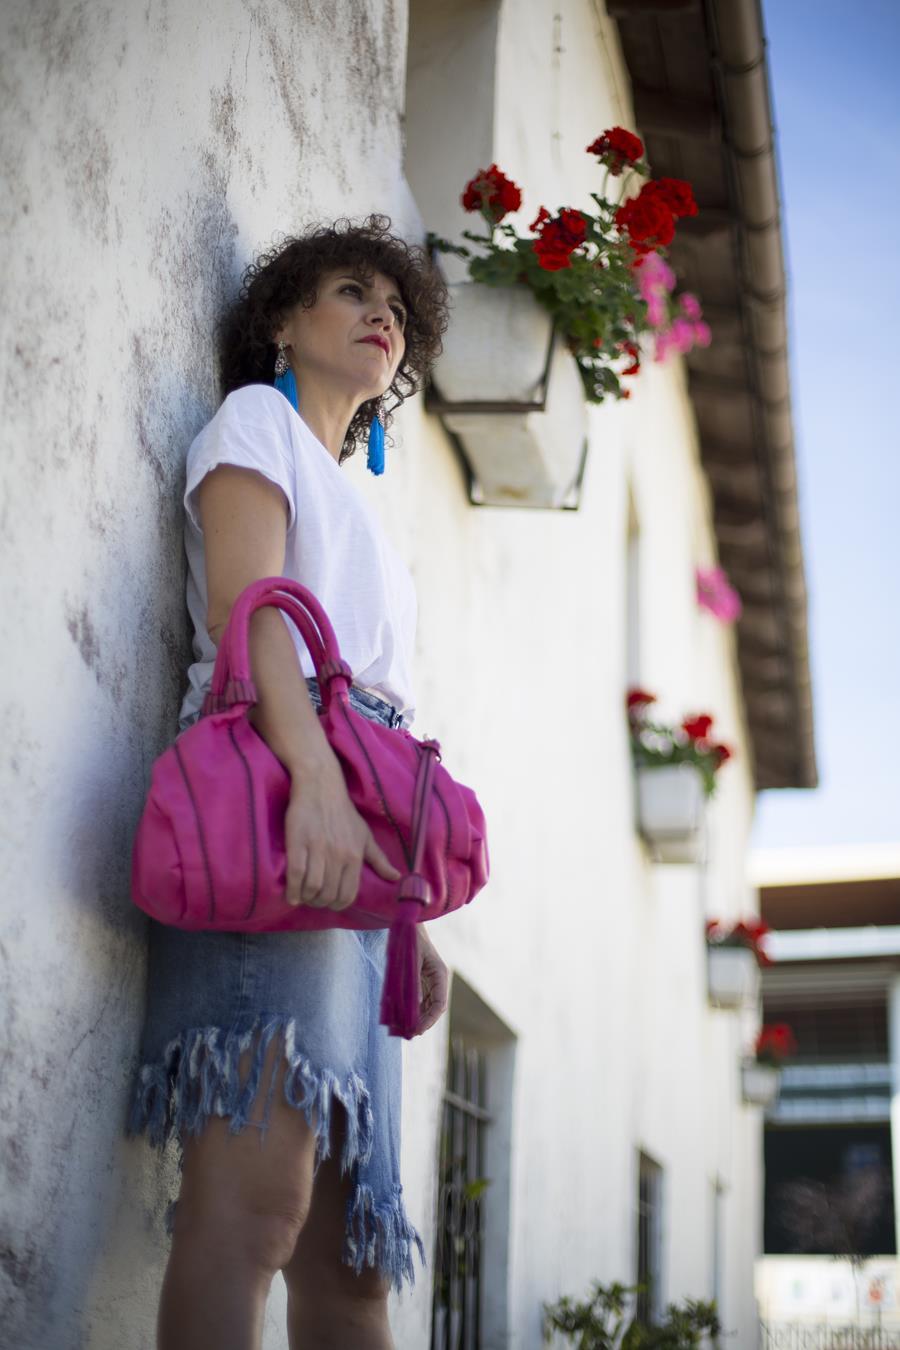 Rebeca Valdivia, Miss Clov, personal shopper, Donostia, San Sebastián, curlpower, curls, sandalia abotinadas, sandals, Pink bag, white tee, denimskirt, camiseta blanca, maxi pendientes, pendientes pompon, maxi earings